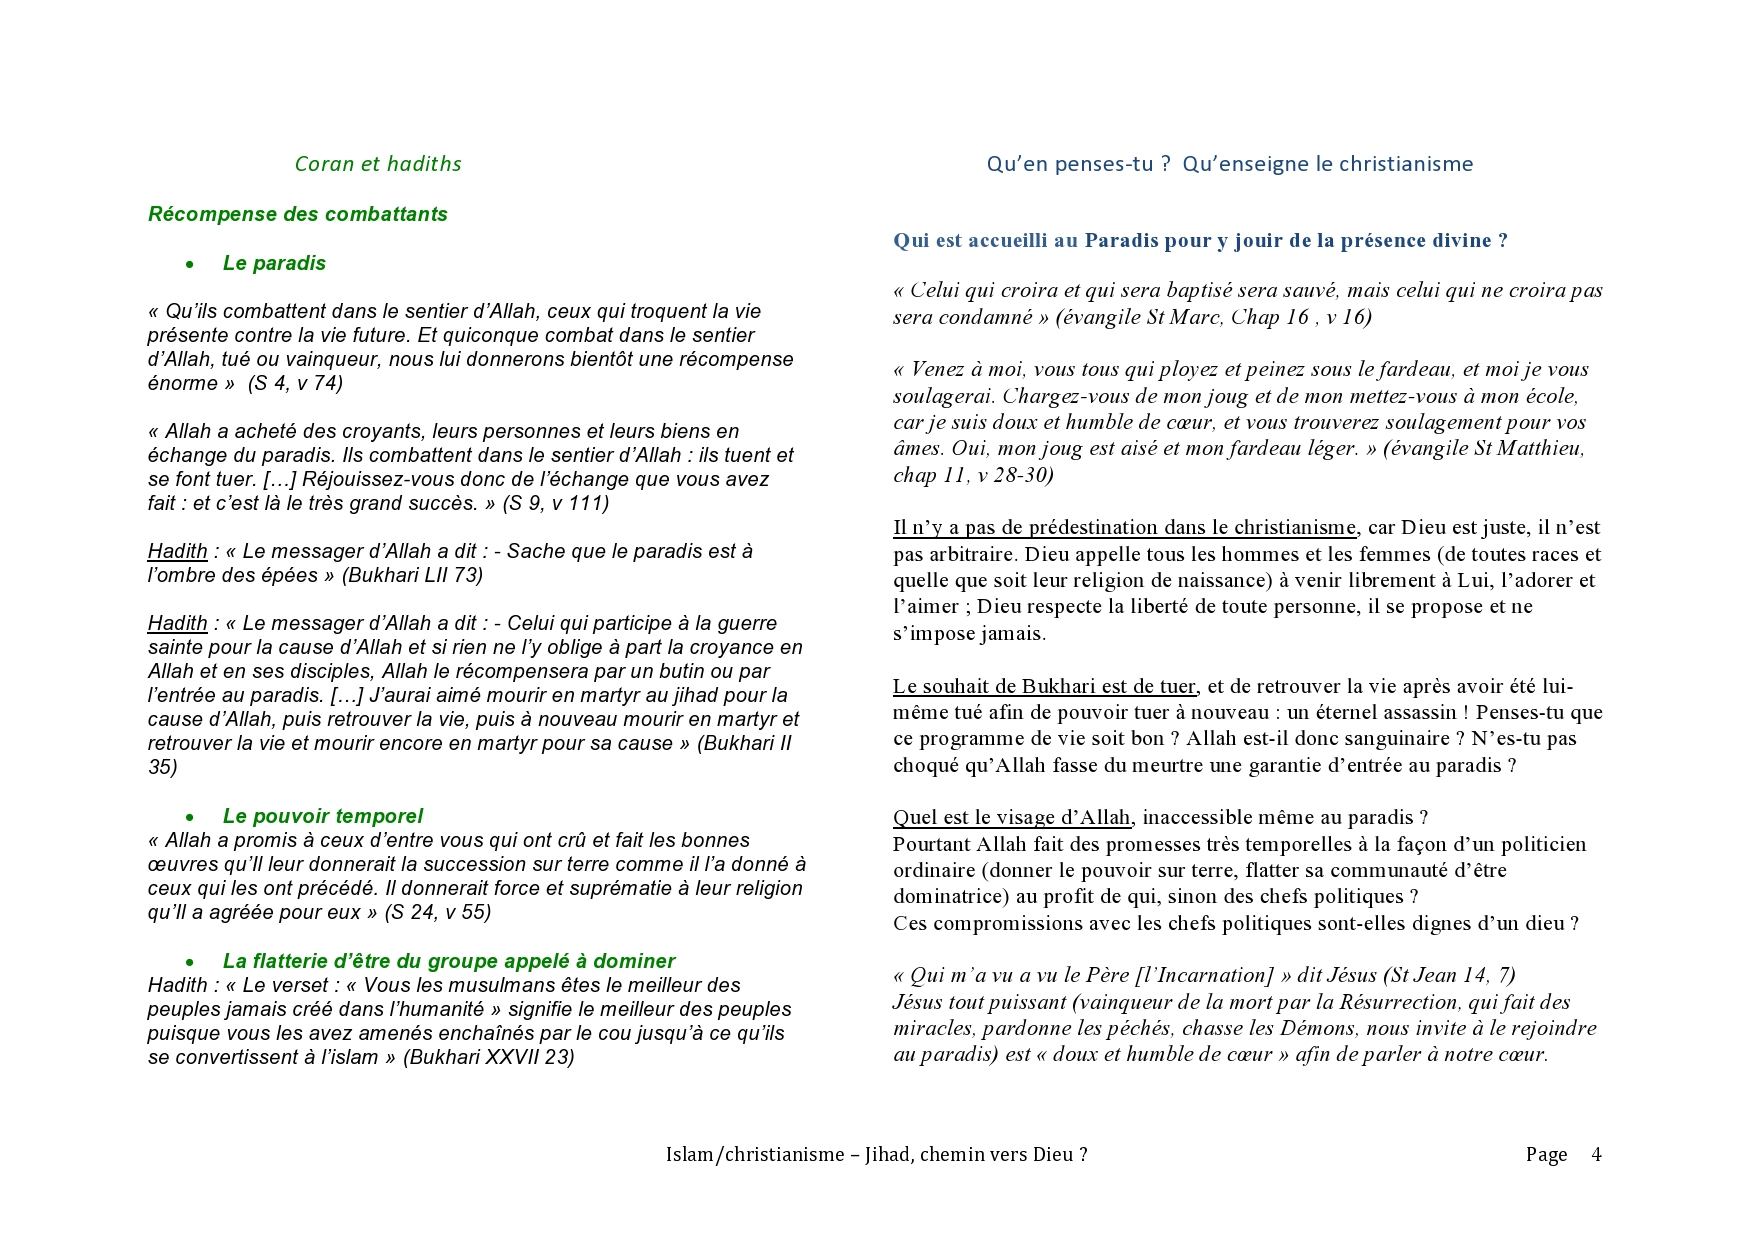 islam-christianisme-jihad-page0004